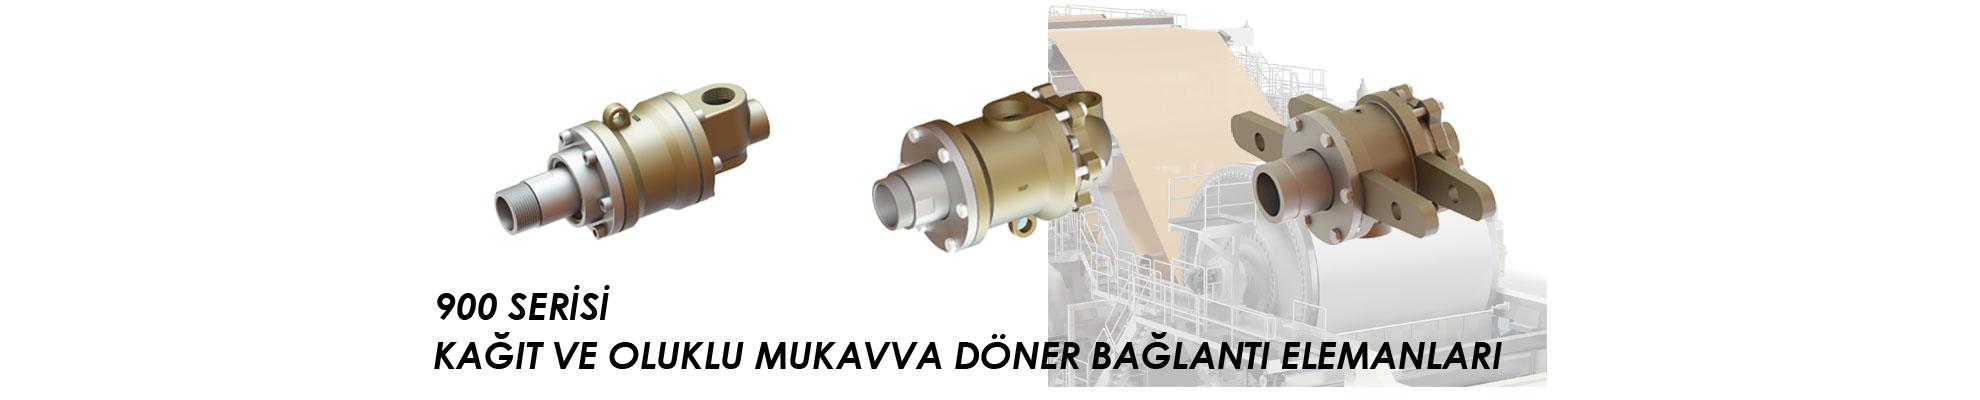 BANNER-YENI-2-1-TURKCE